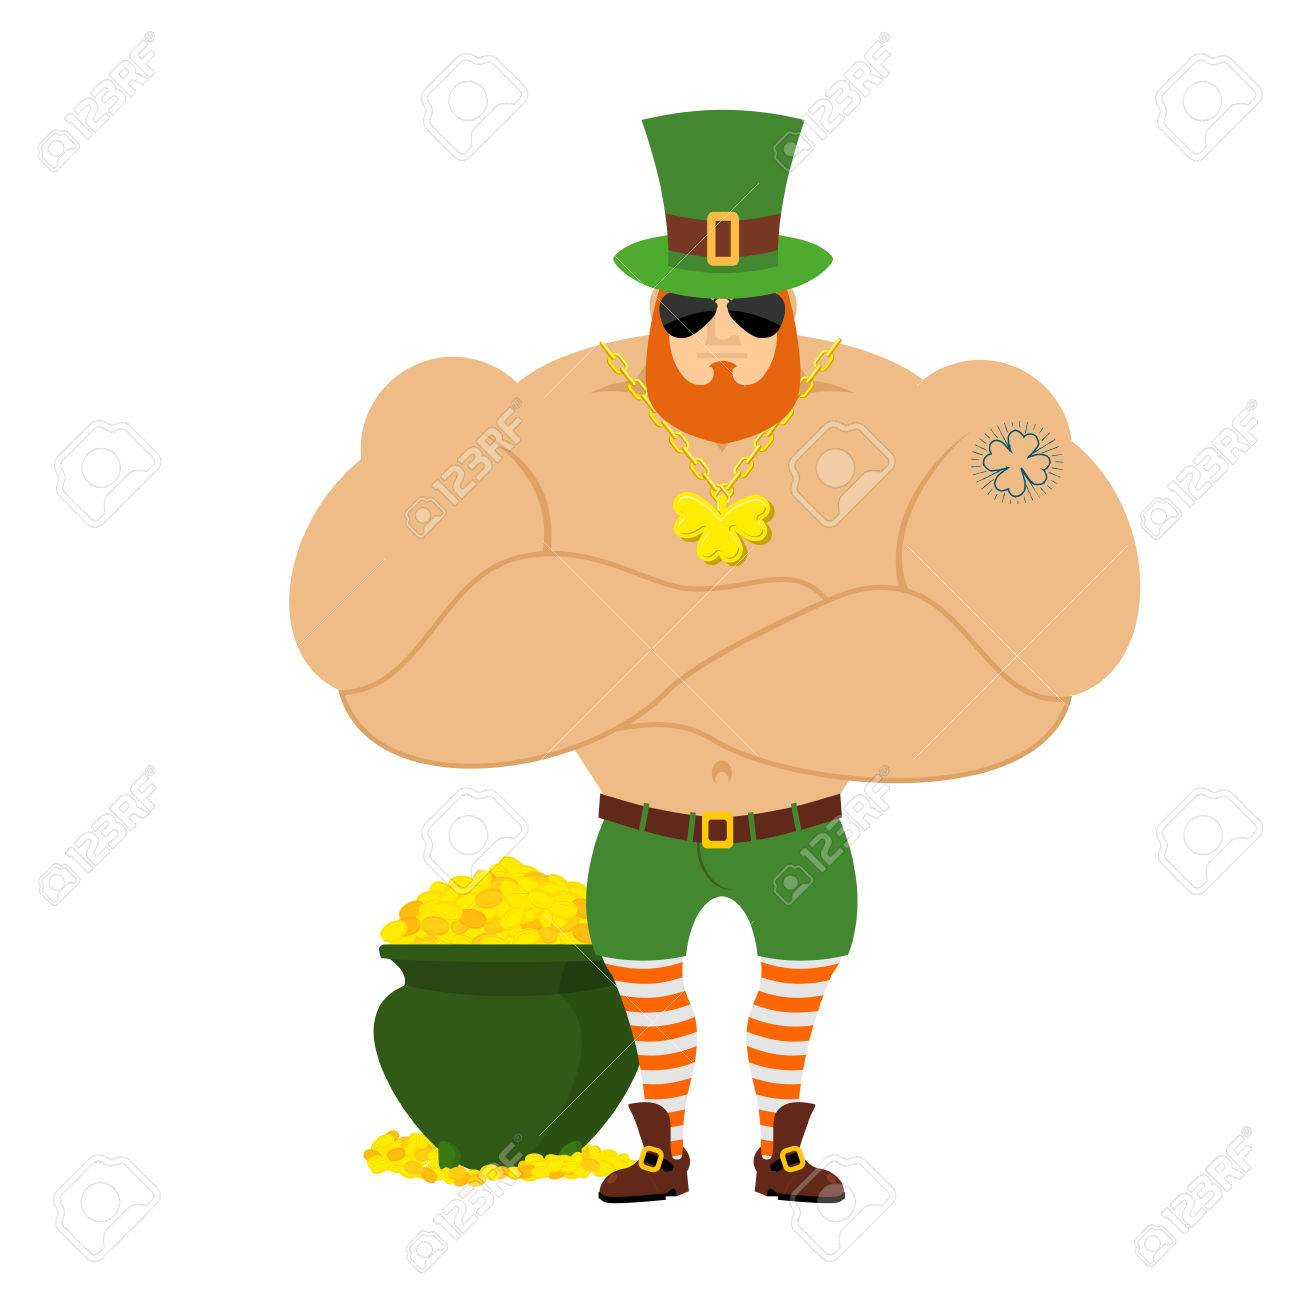 dab86386e99bf 52470889-strong-leprechaun-powerful-big-leprechaun-in-green-hat -bodybuilder-in-red-beard-sports-man-with-big-.jpg